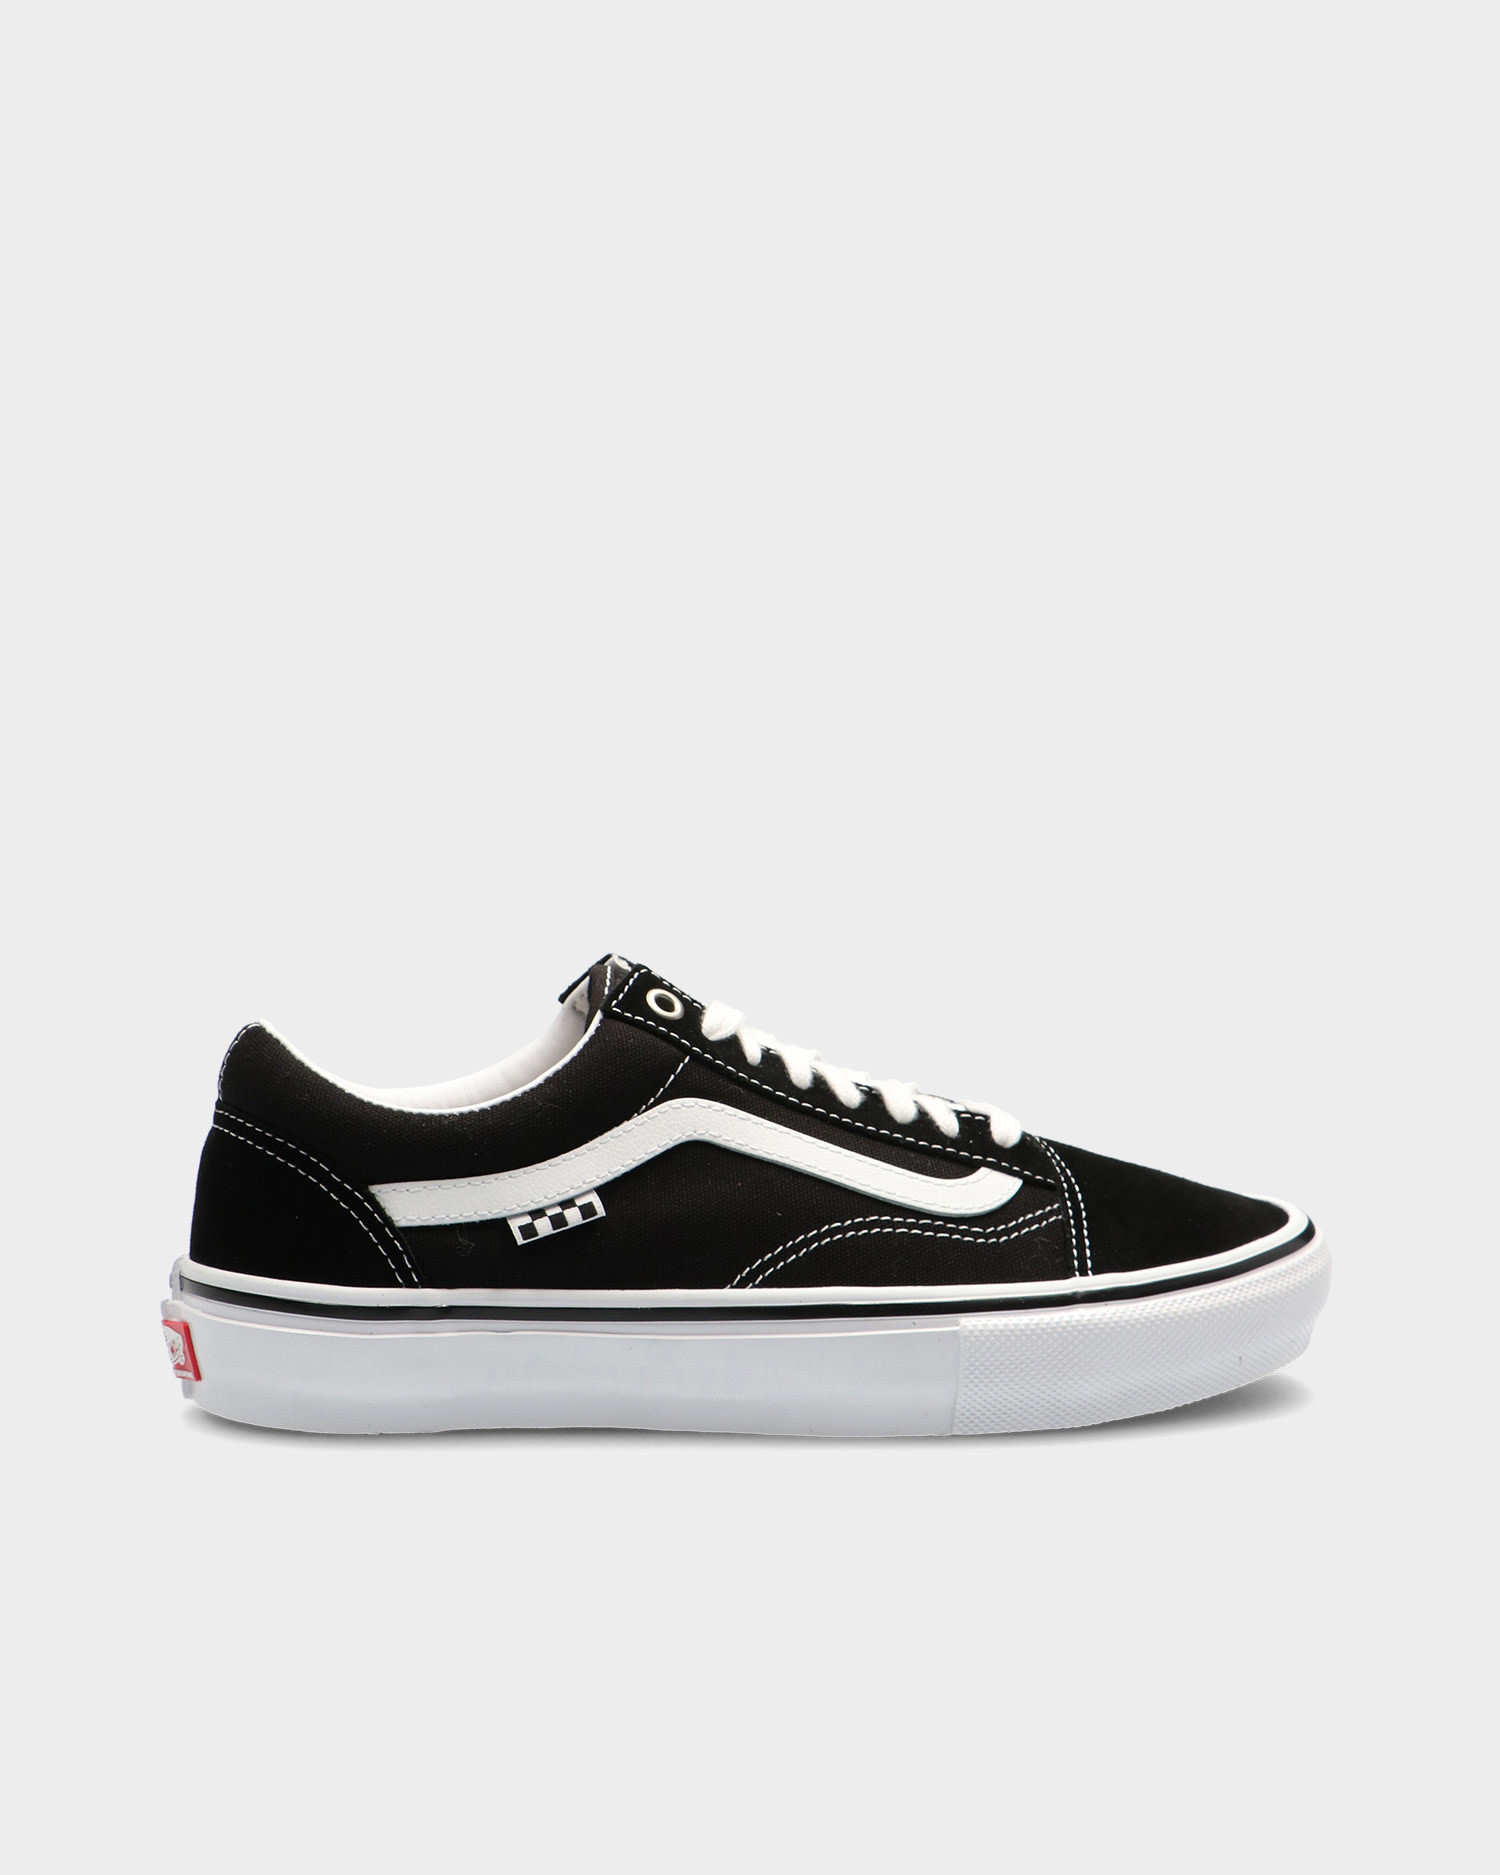 Vans Skate Old Skool Black/White